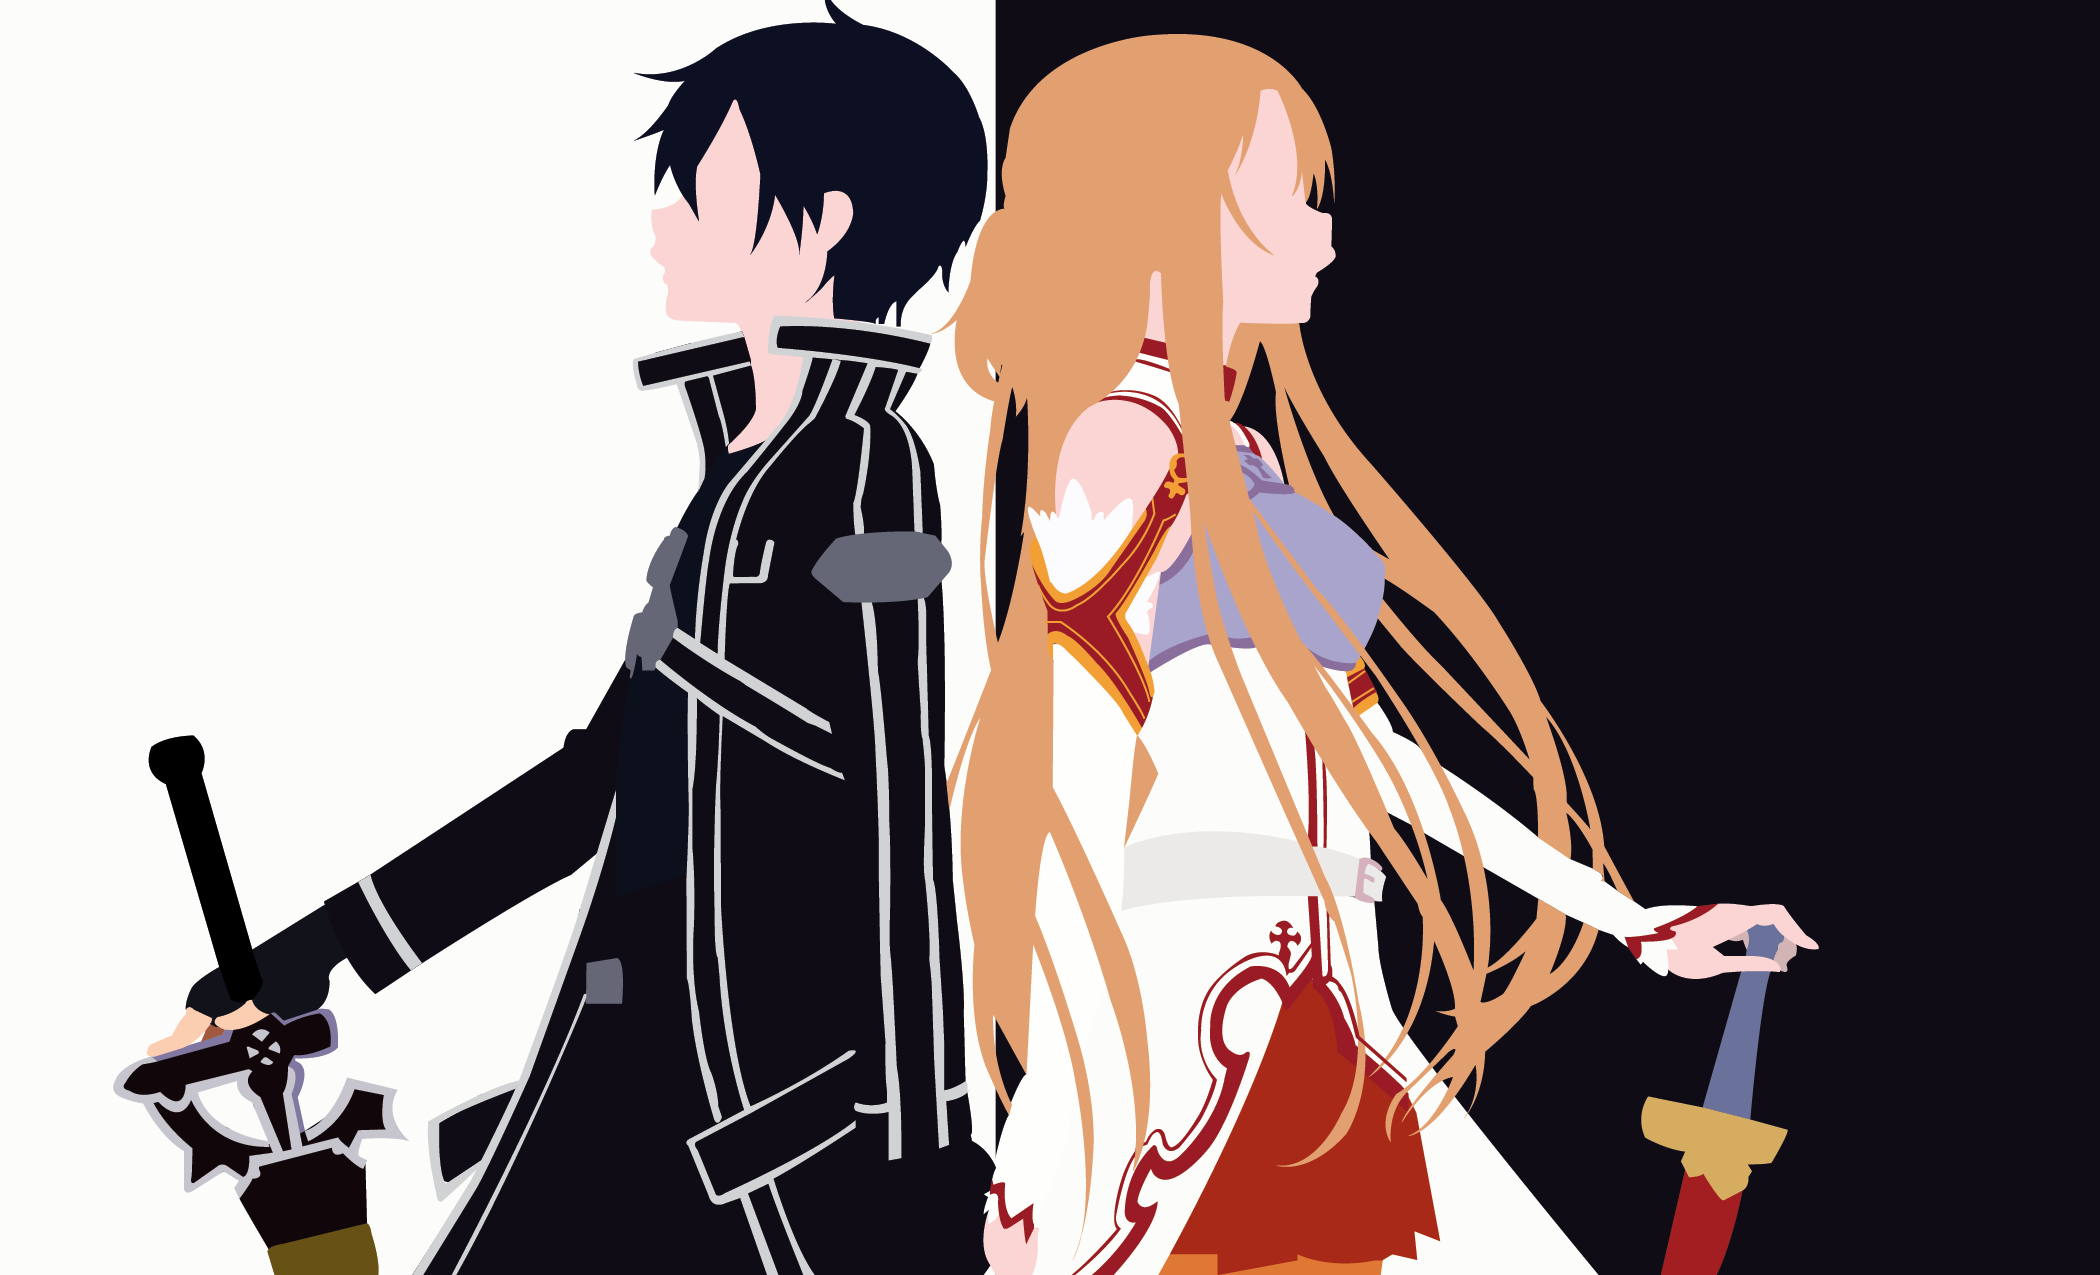 1070 kirito sword art online hd wallpapers backgrounds for Minimal art online